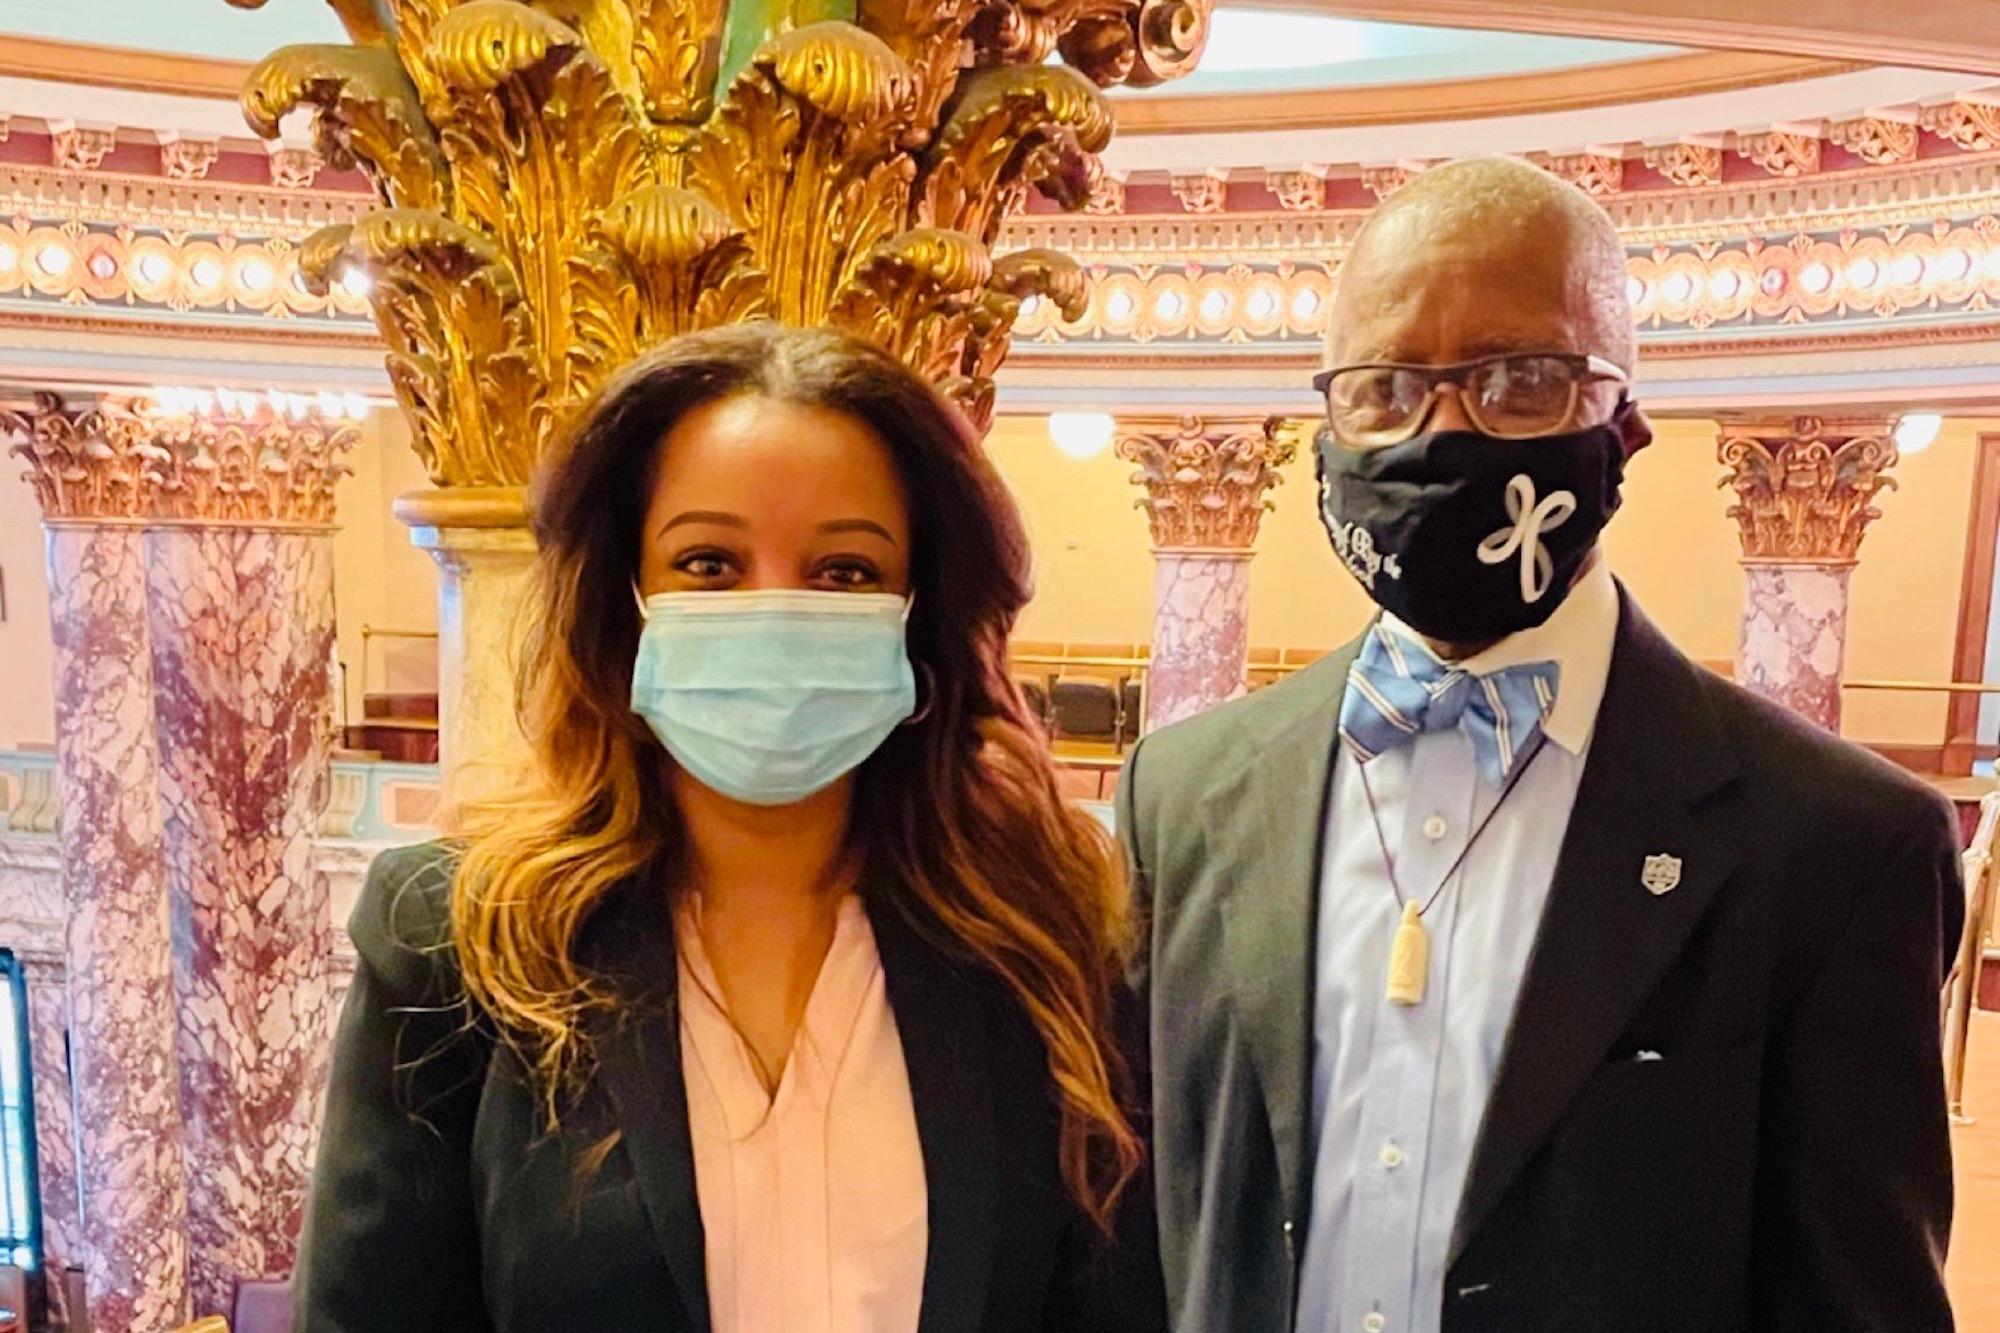 Crystal Welch and Senator Hillman Frazier, both wearing masks, stand inside the U.S. Capitol rotunda